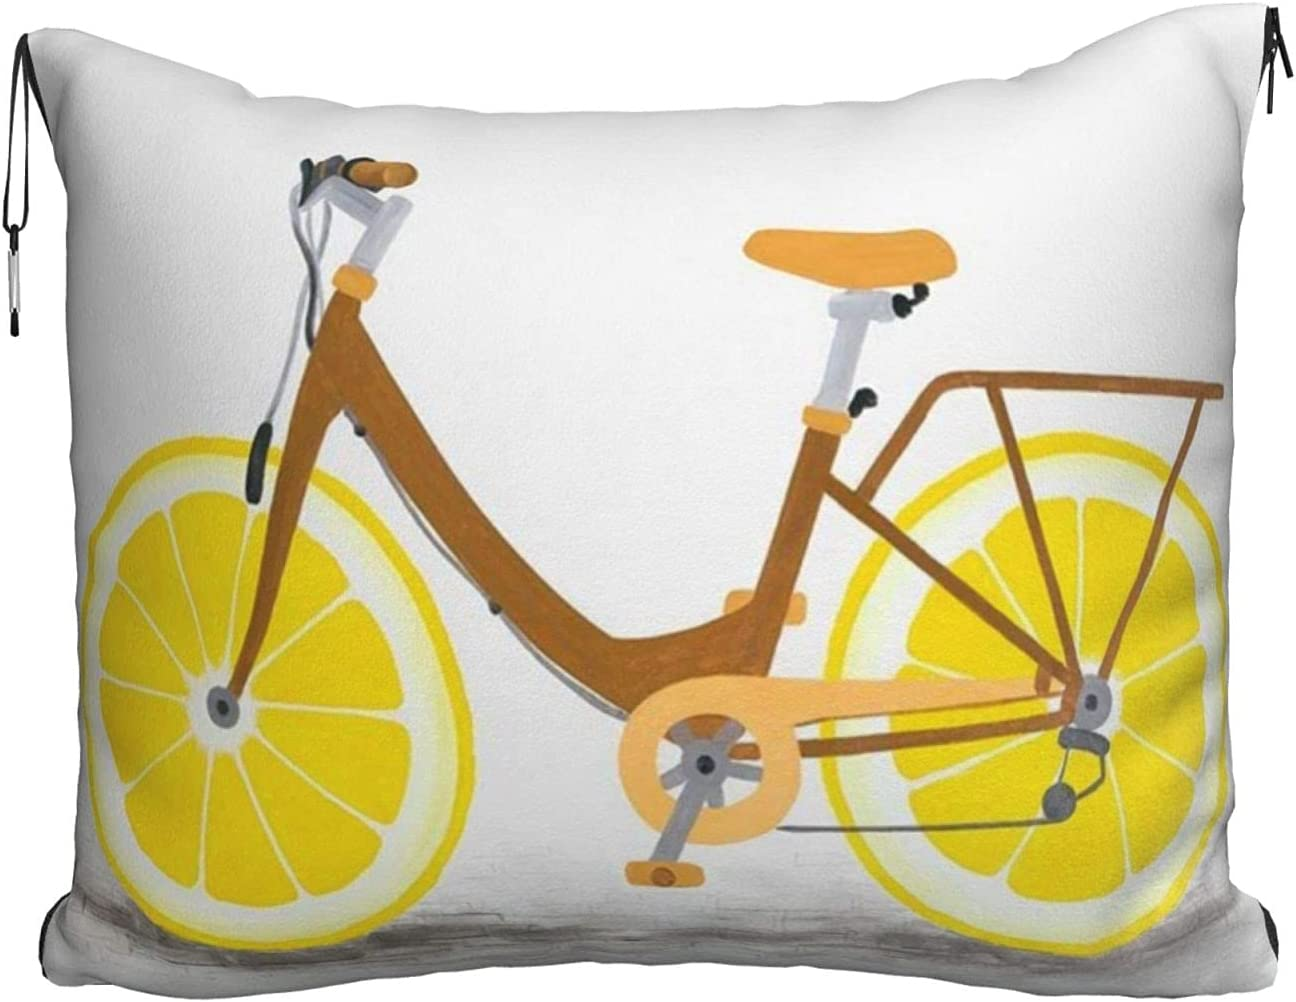 Mescchskbicycle with Very popular Lemon Wheel Print Blanket Pillow Travel Com Portland Mall